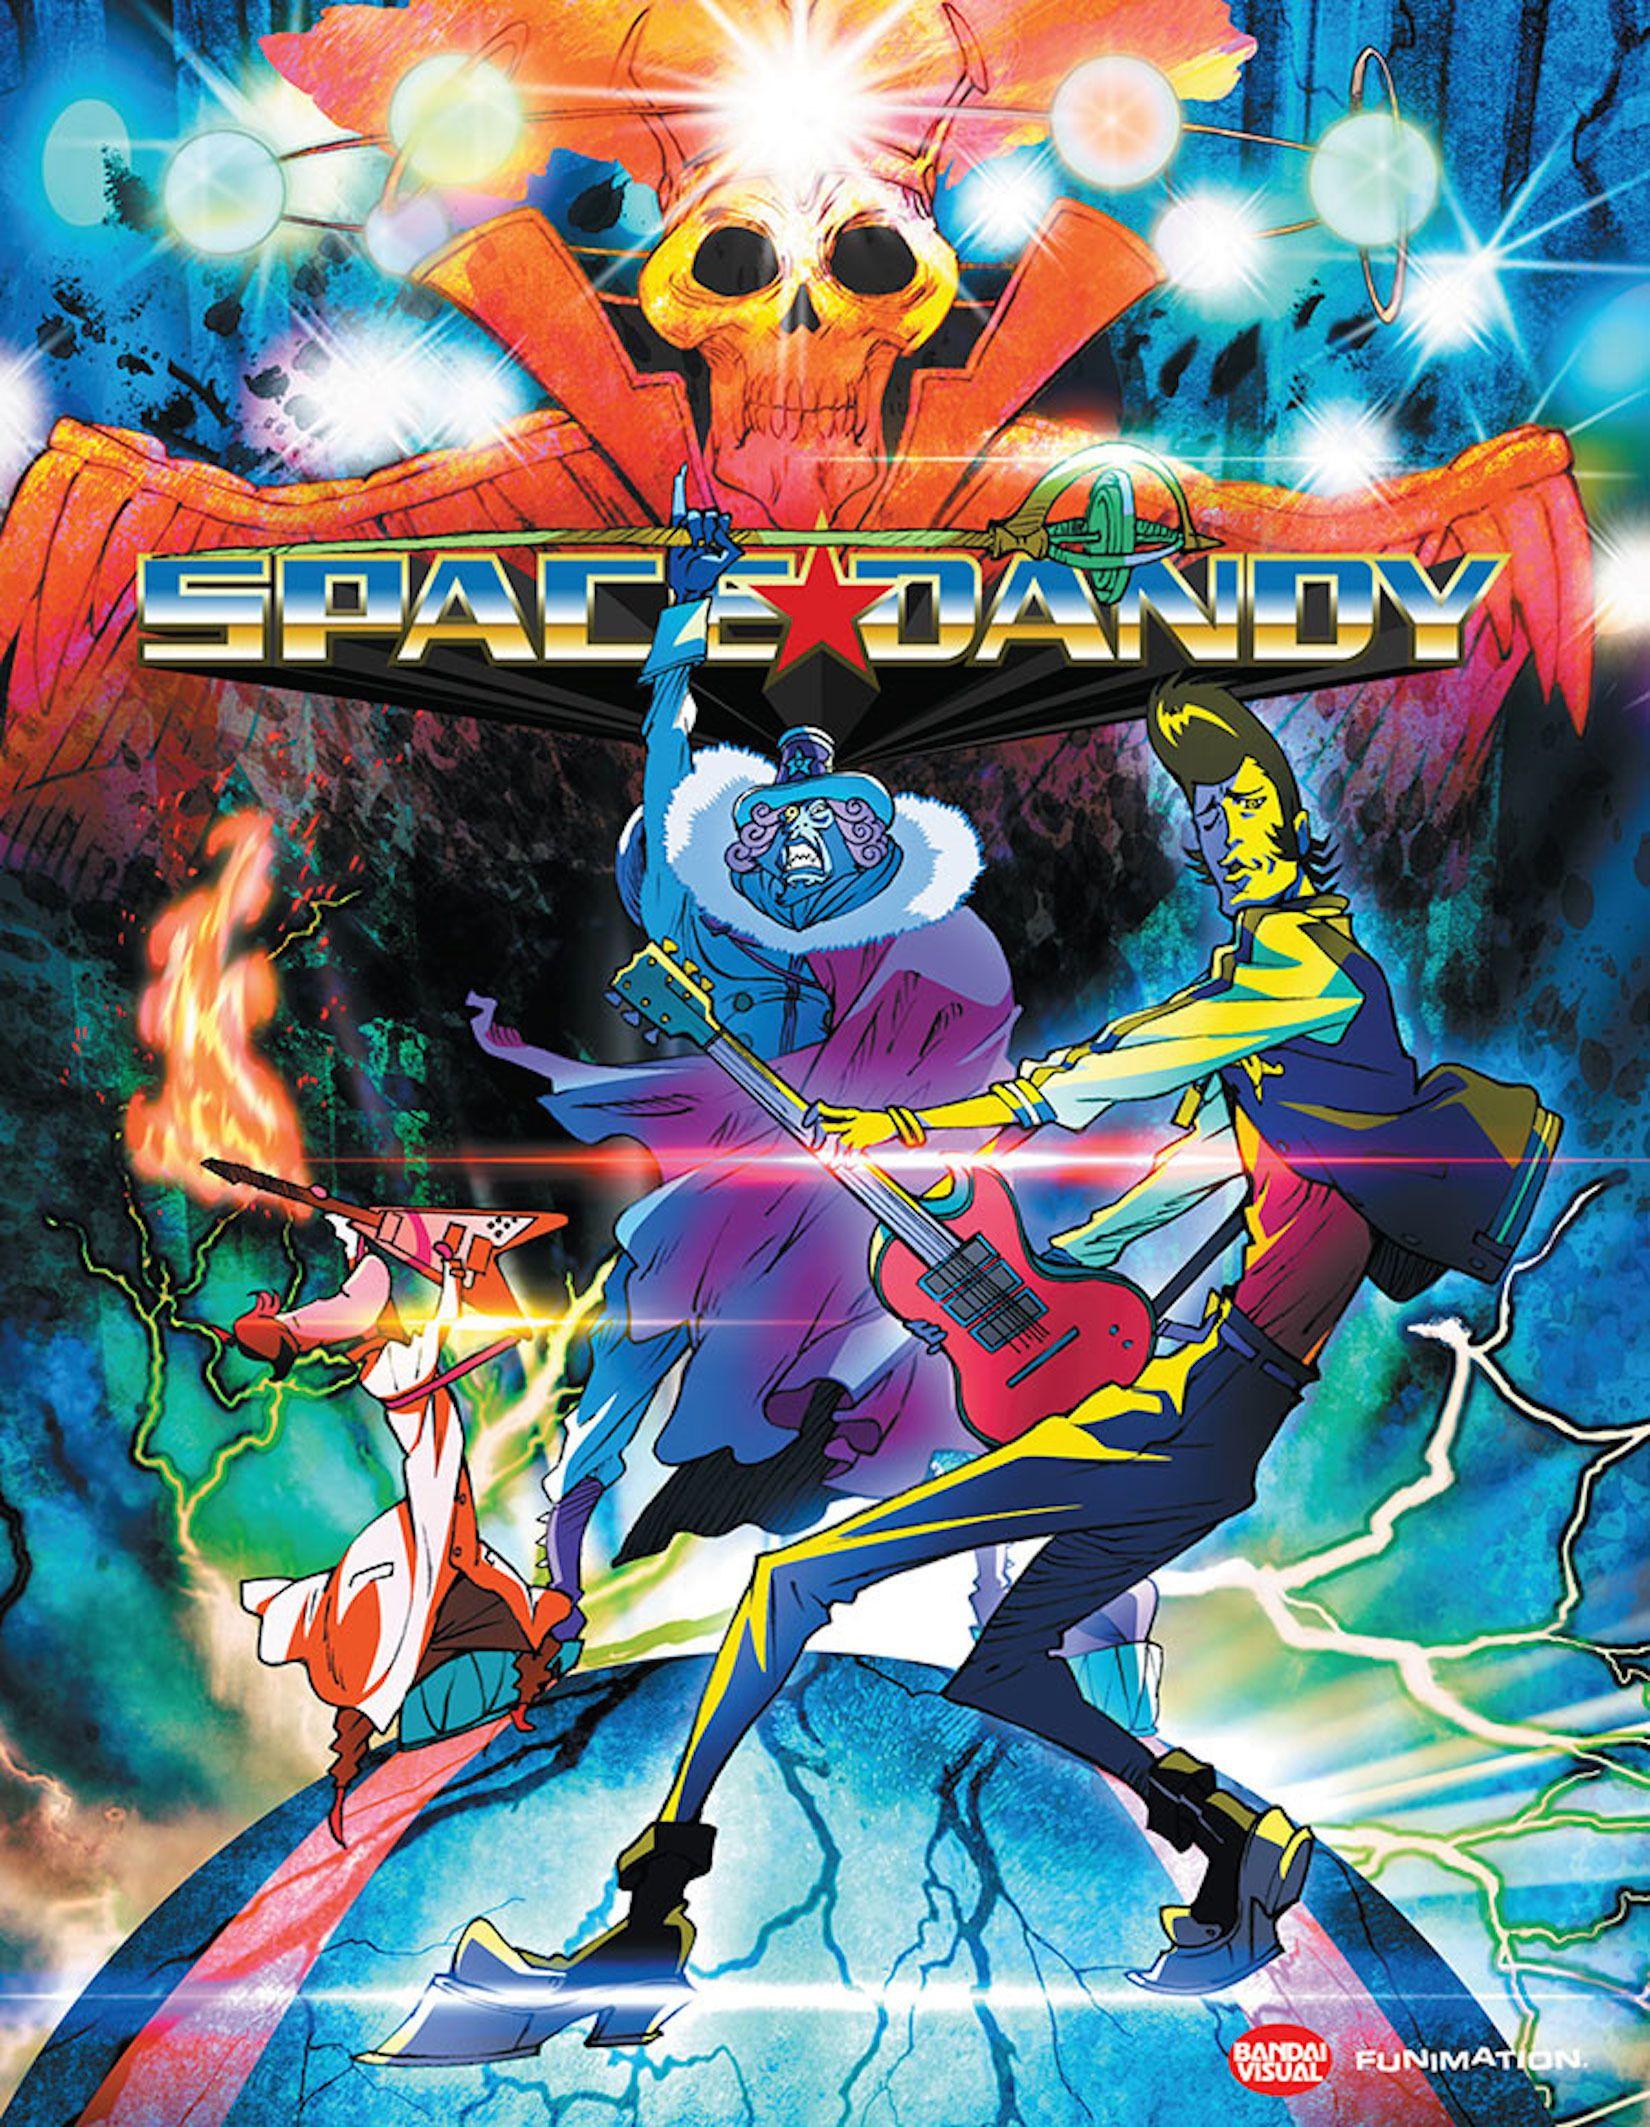 Naruto Shippuden Cancelled? Space dandy, Dandy, Anime